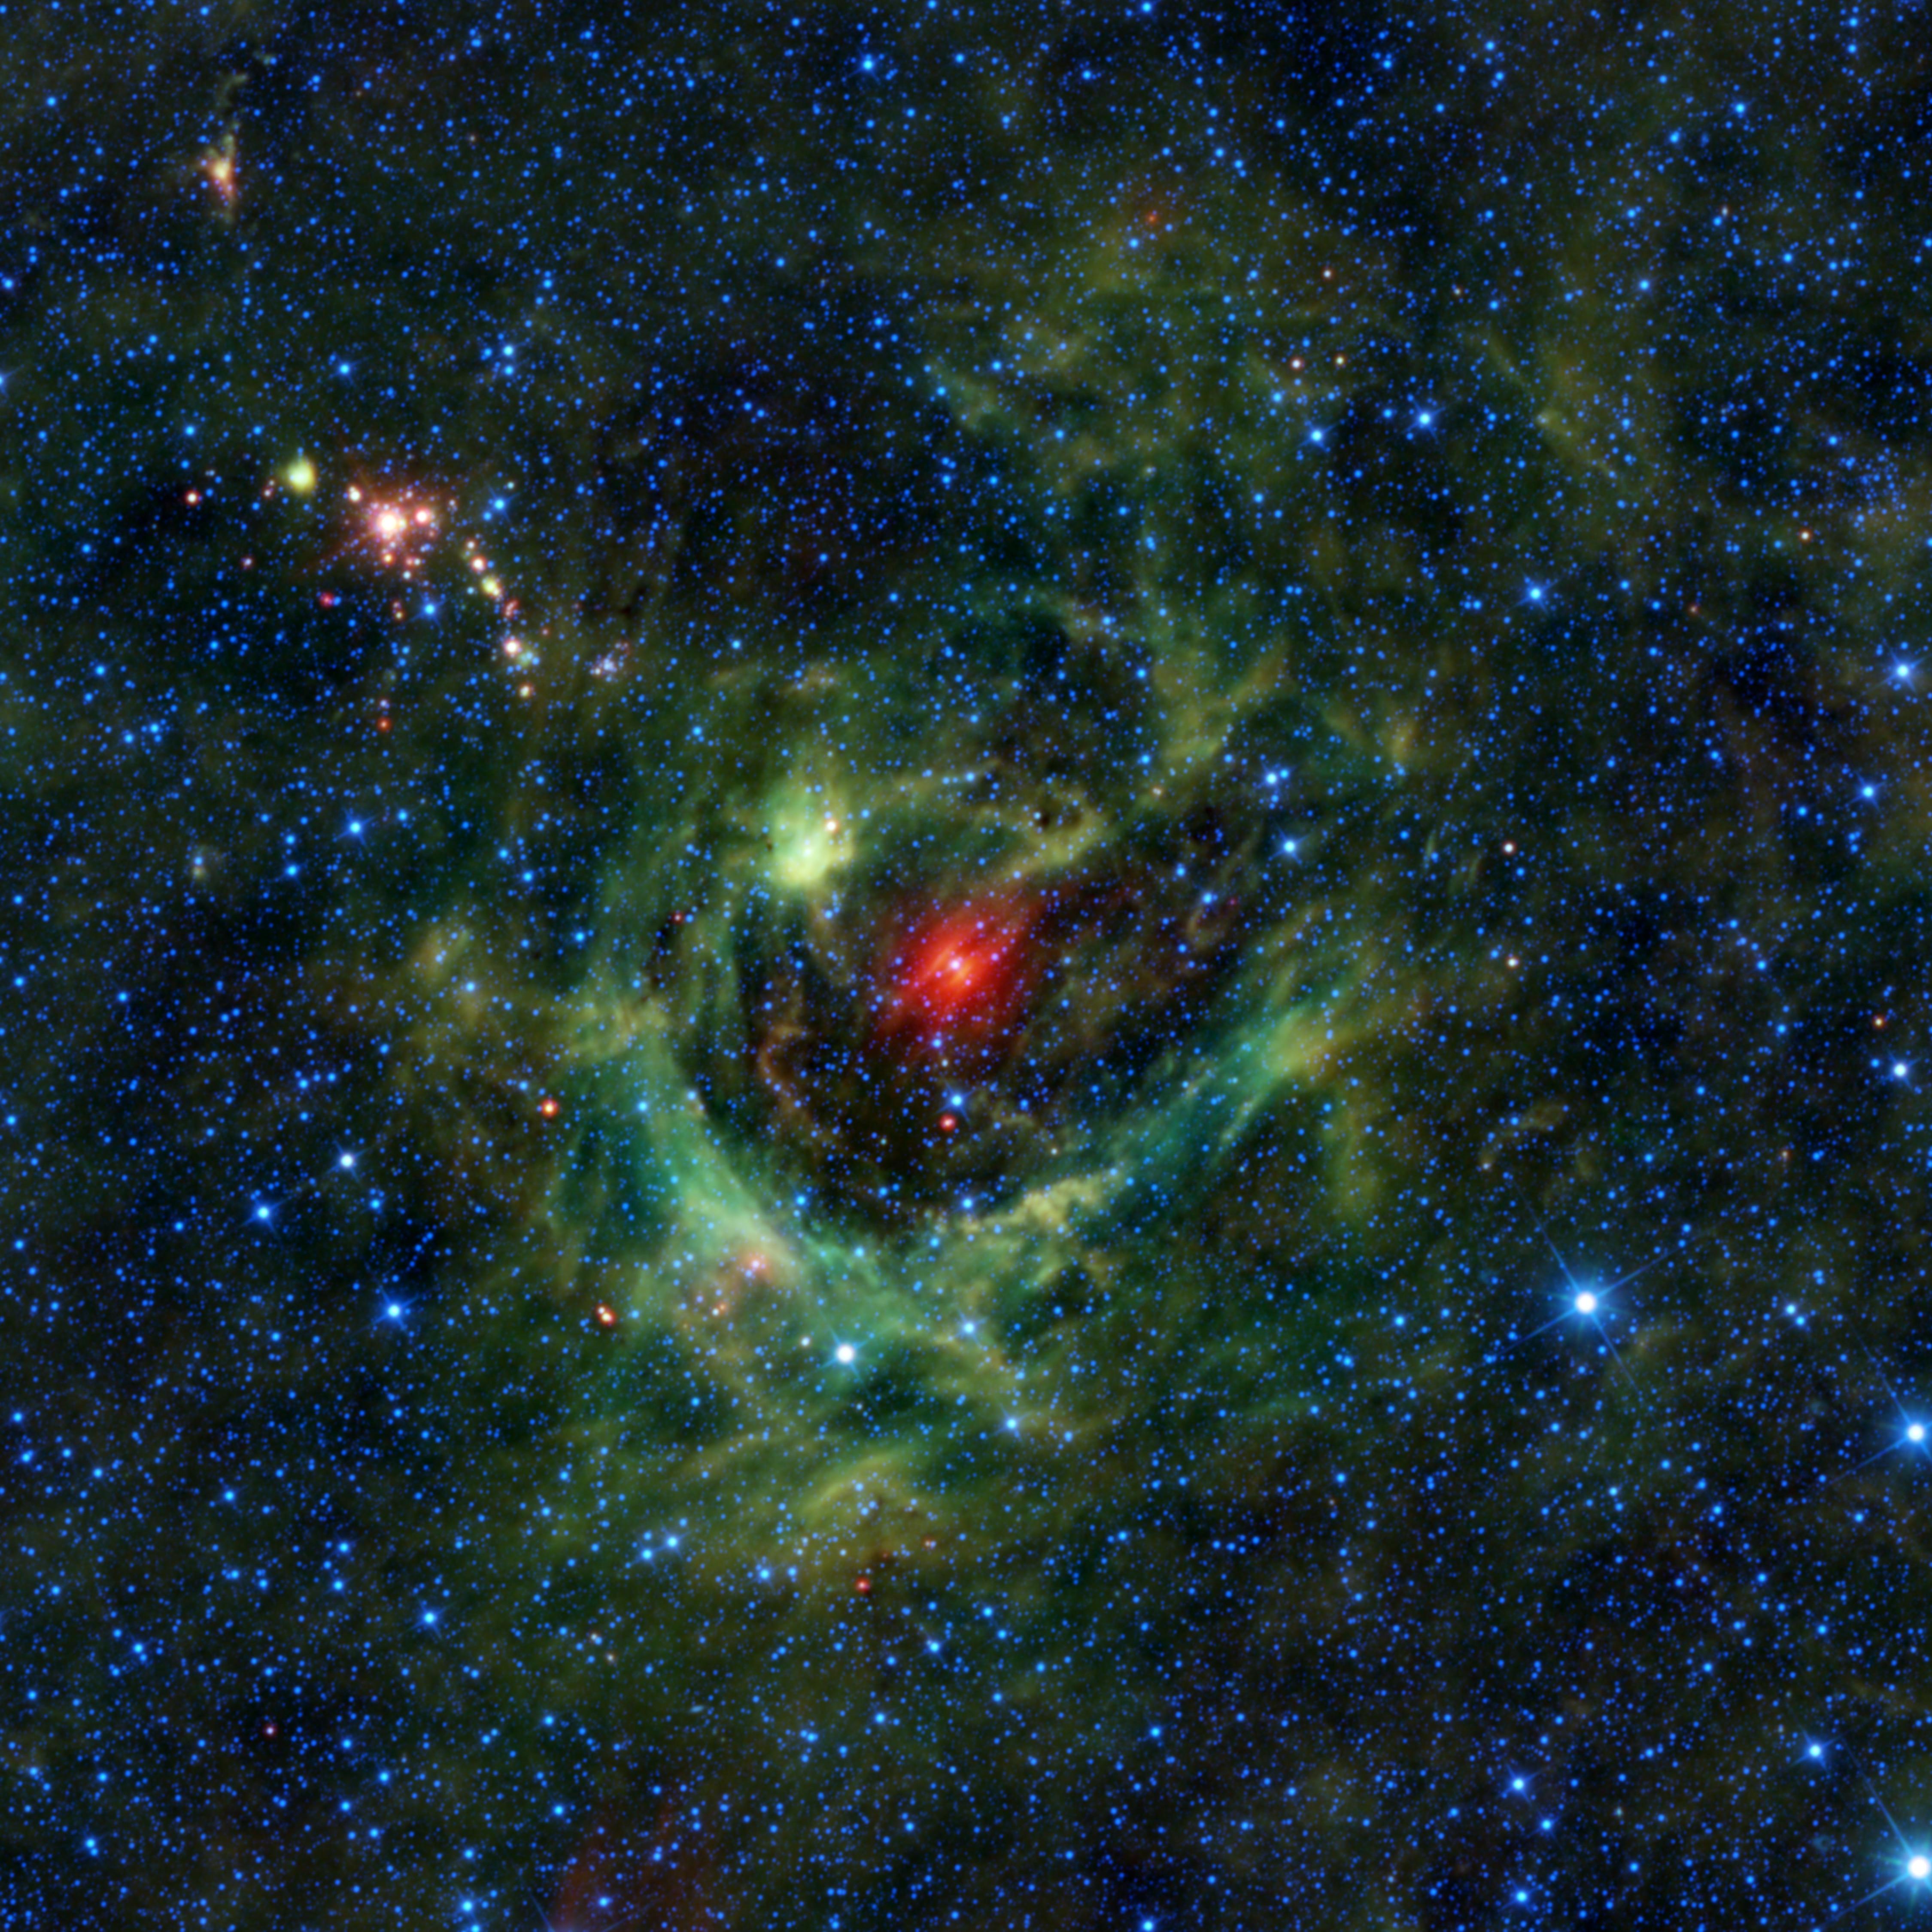 Фото звезда мира 8 фотография